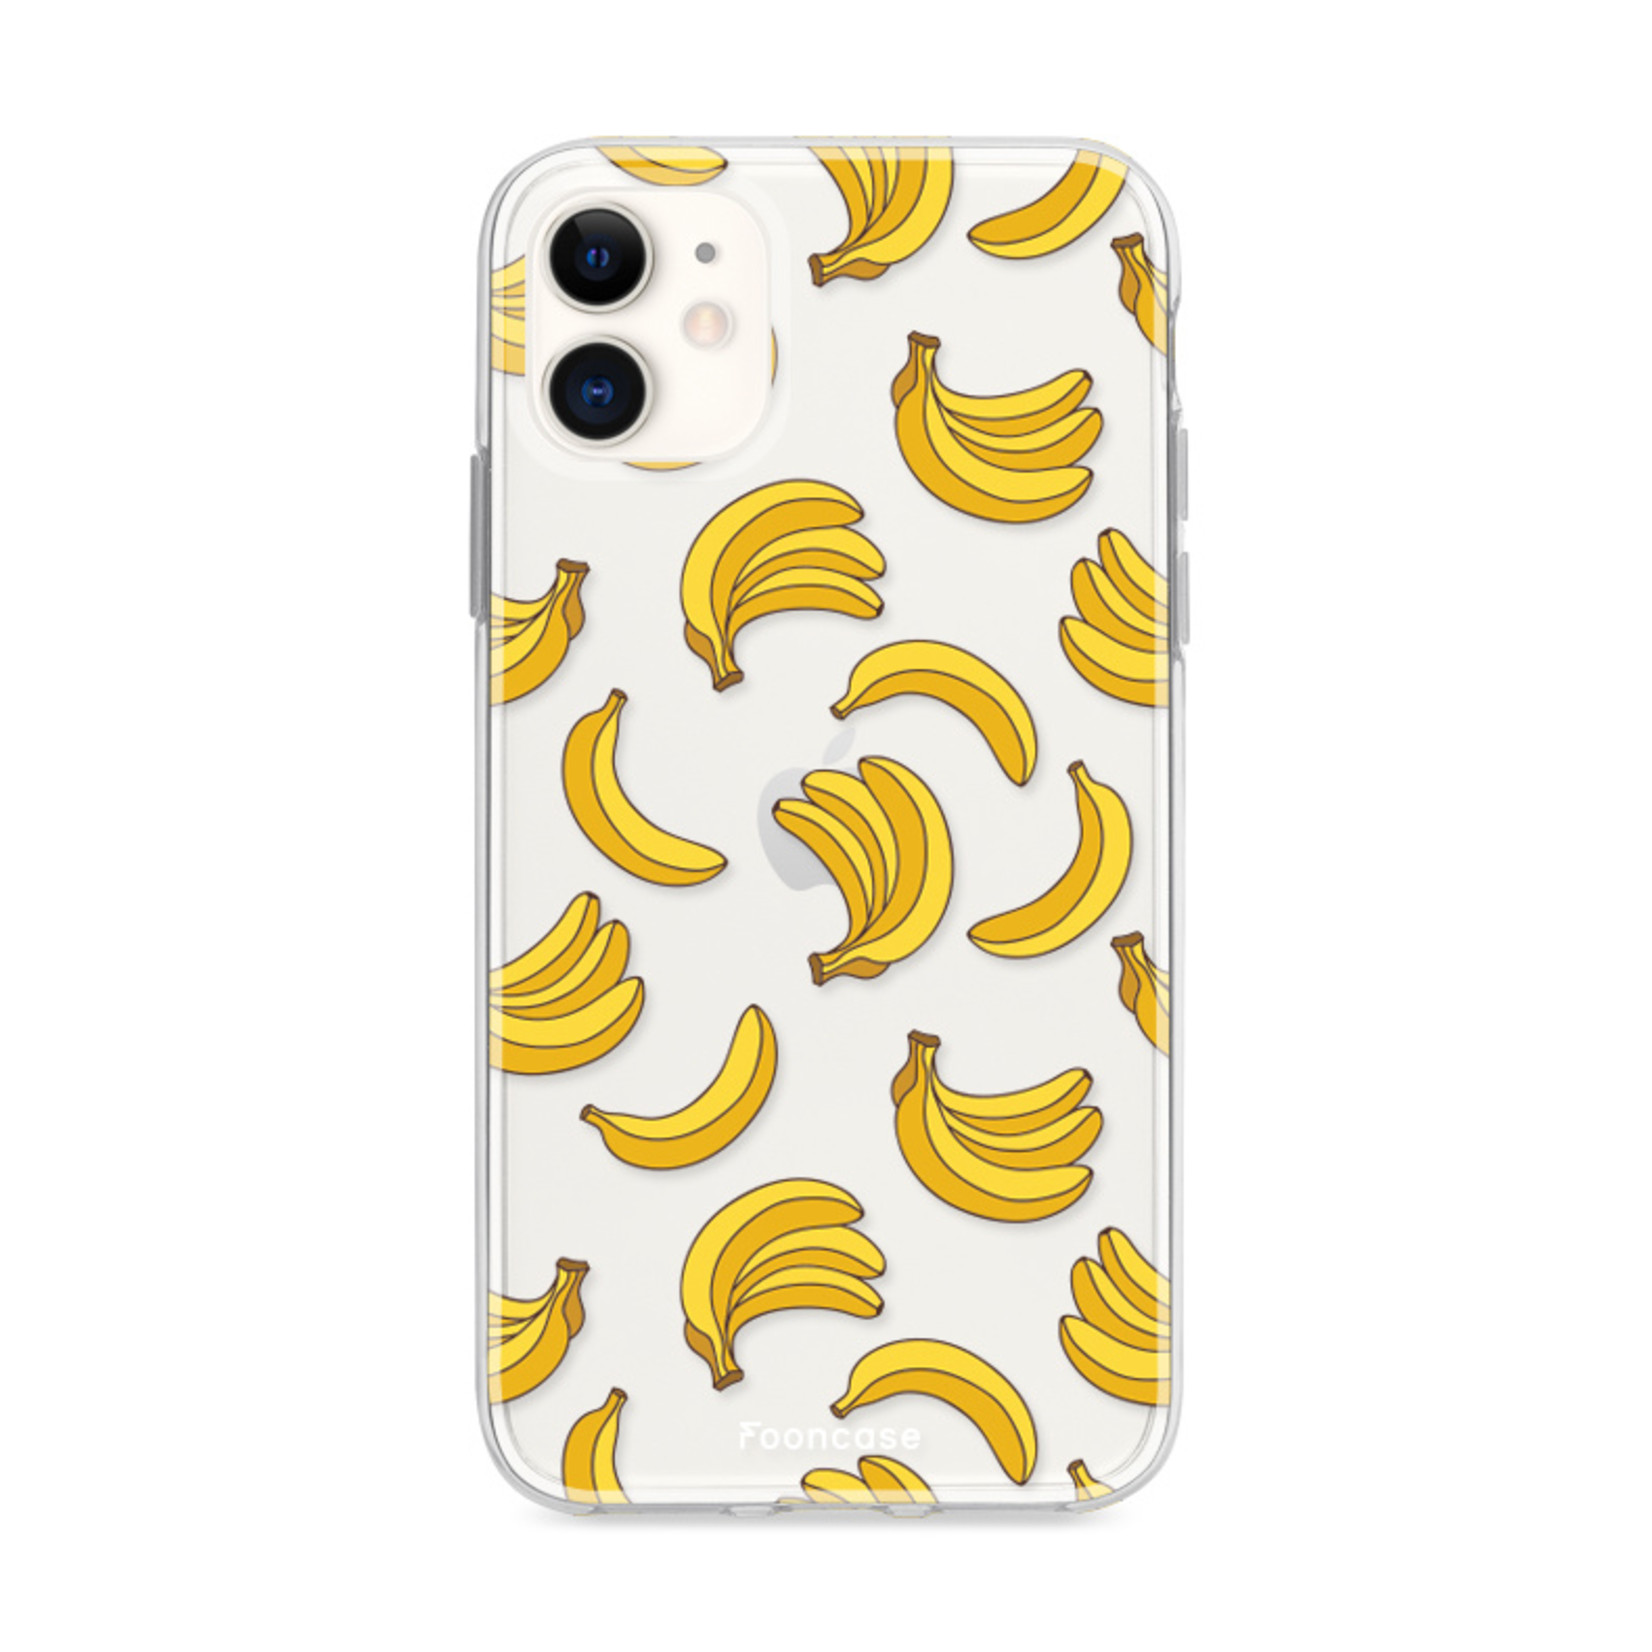 FOONCASE Iphone 11 Handyhülle - Bananas